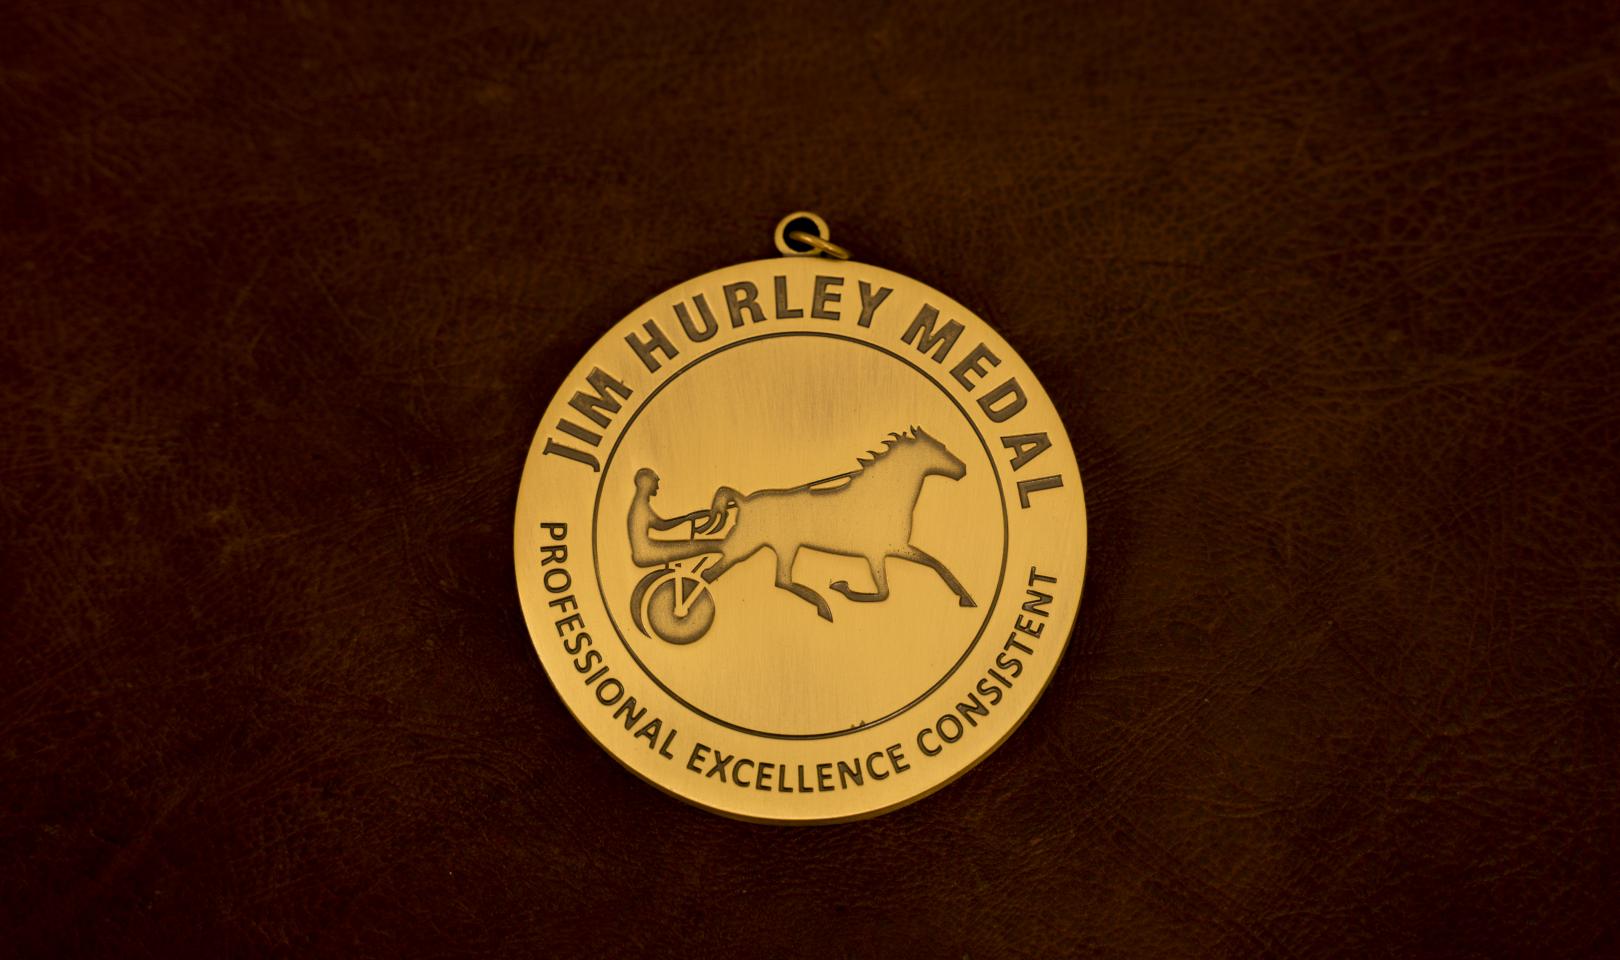 Jim Hurley Medal